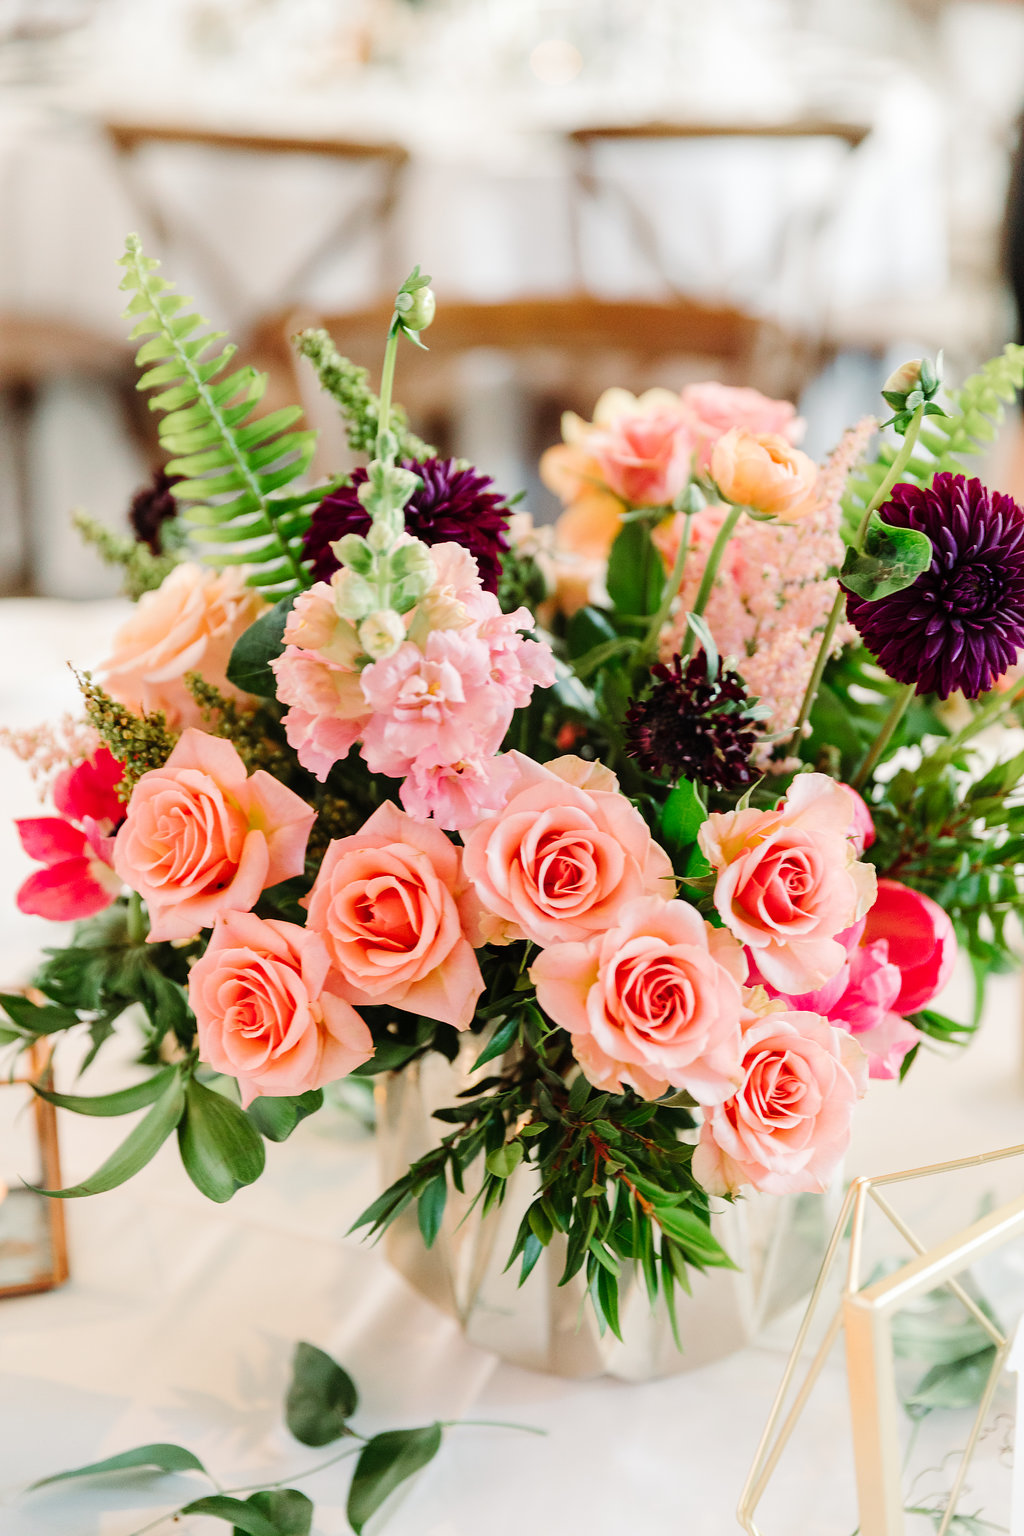 Airship_37_toronto_wedding_photography_magnolia_studios-652.jpg